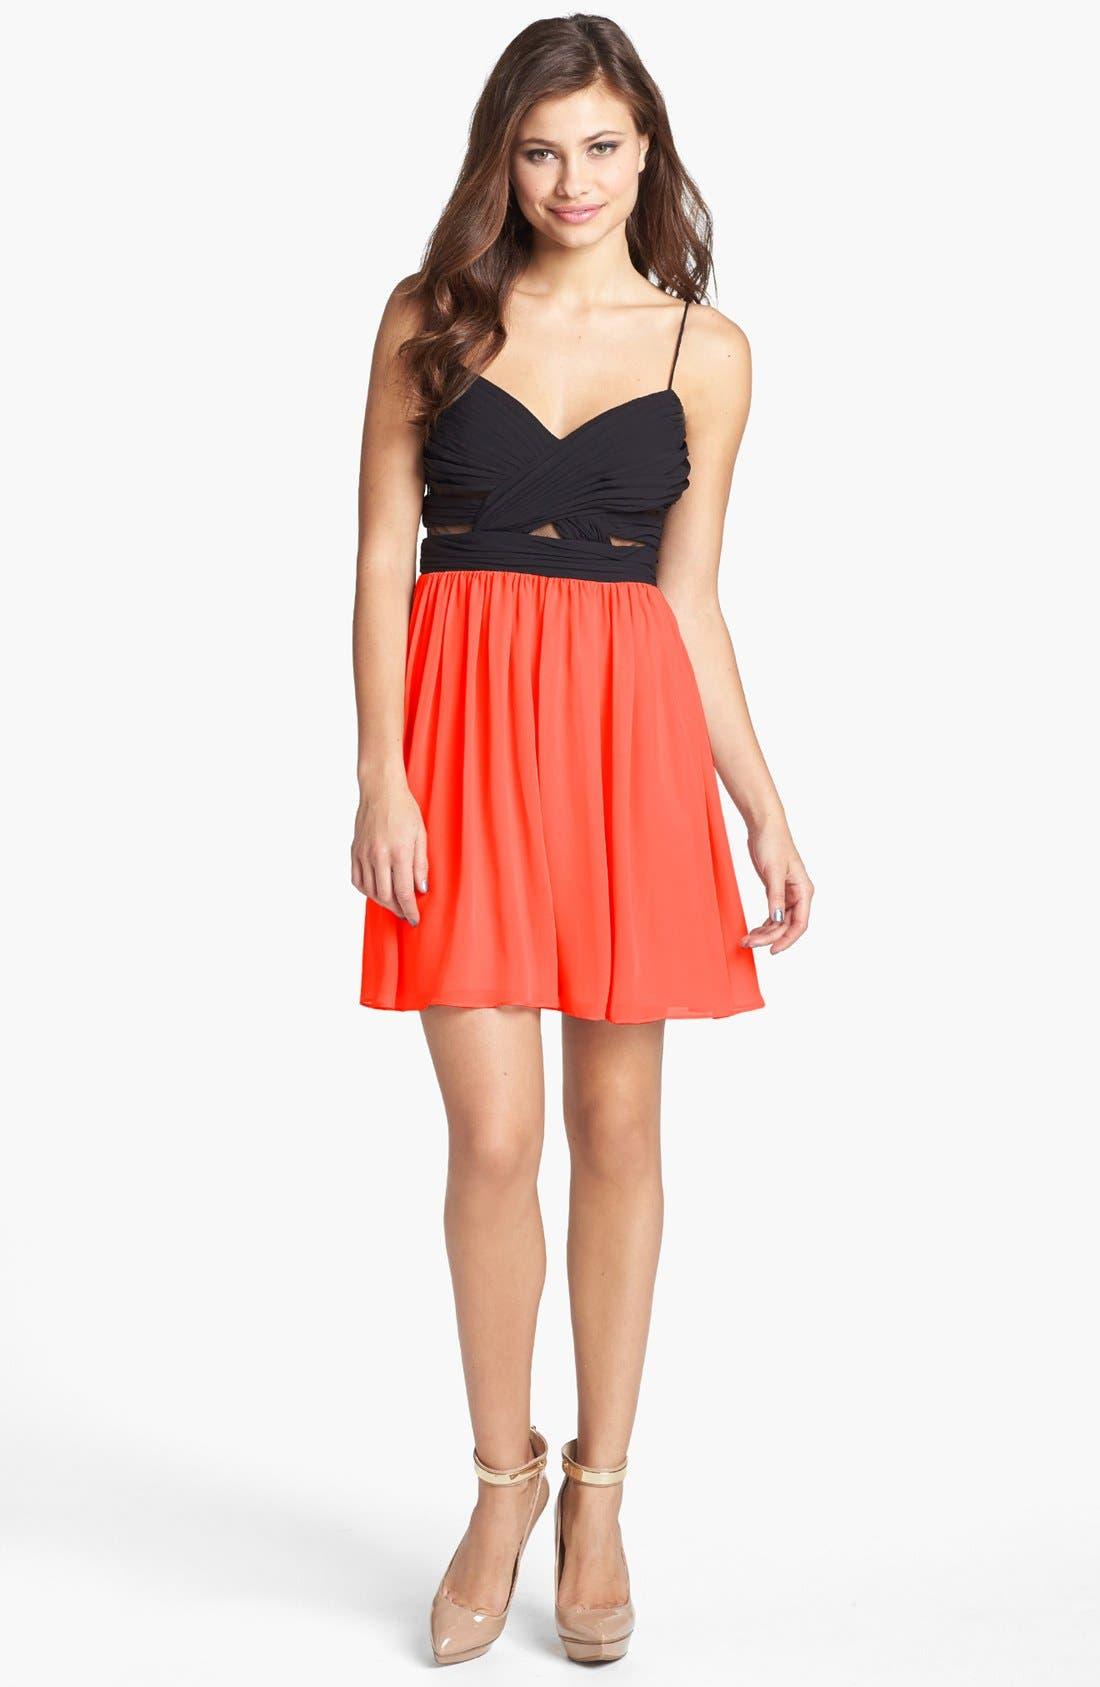 Alternate Image 1 Selected - Hailey Logan Mesh Inset Chiffon Skater Dress (Juniors) (Online Only)